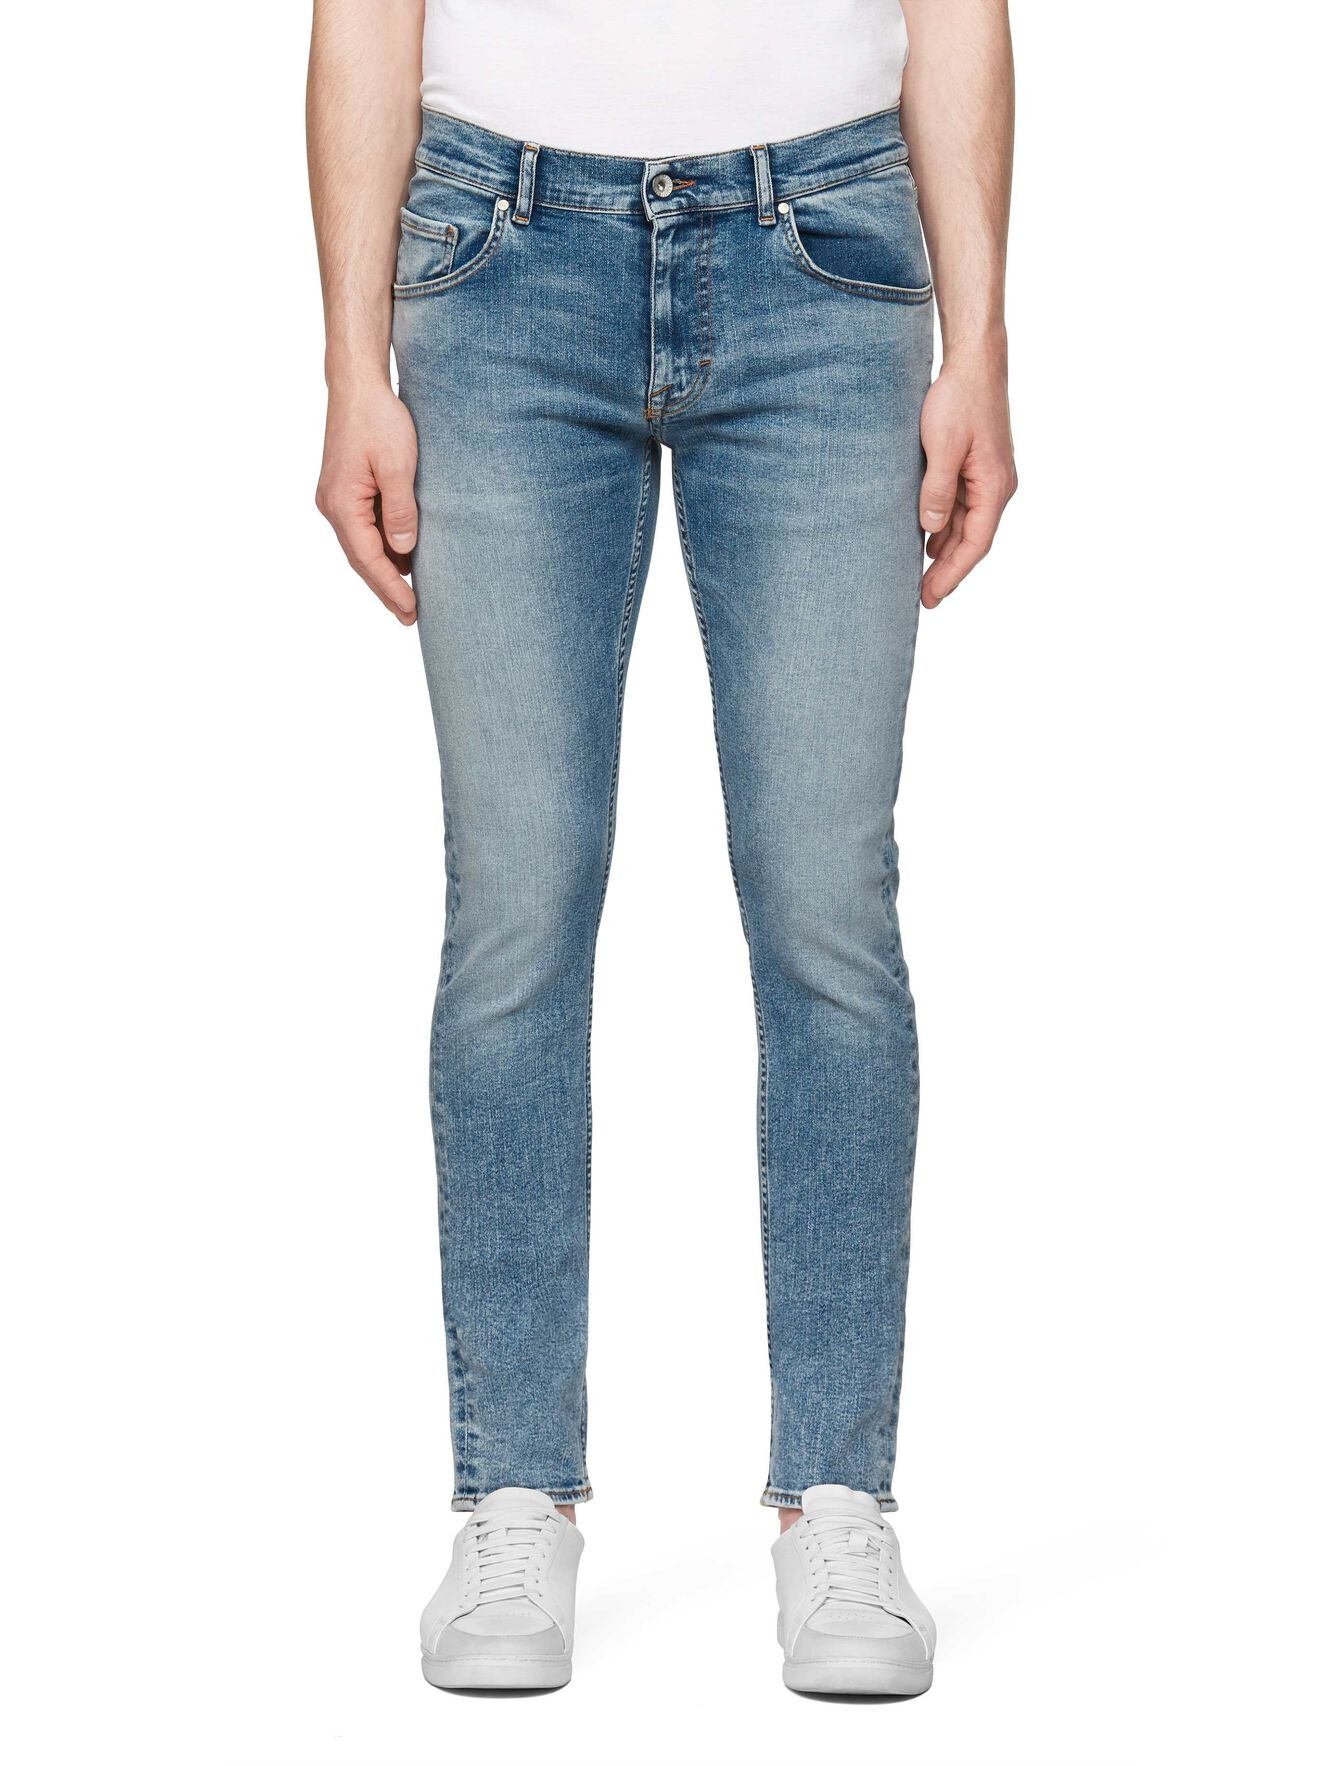 Slim Jeans in Light blue from Tiger of Sweden